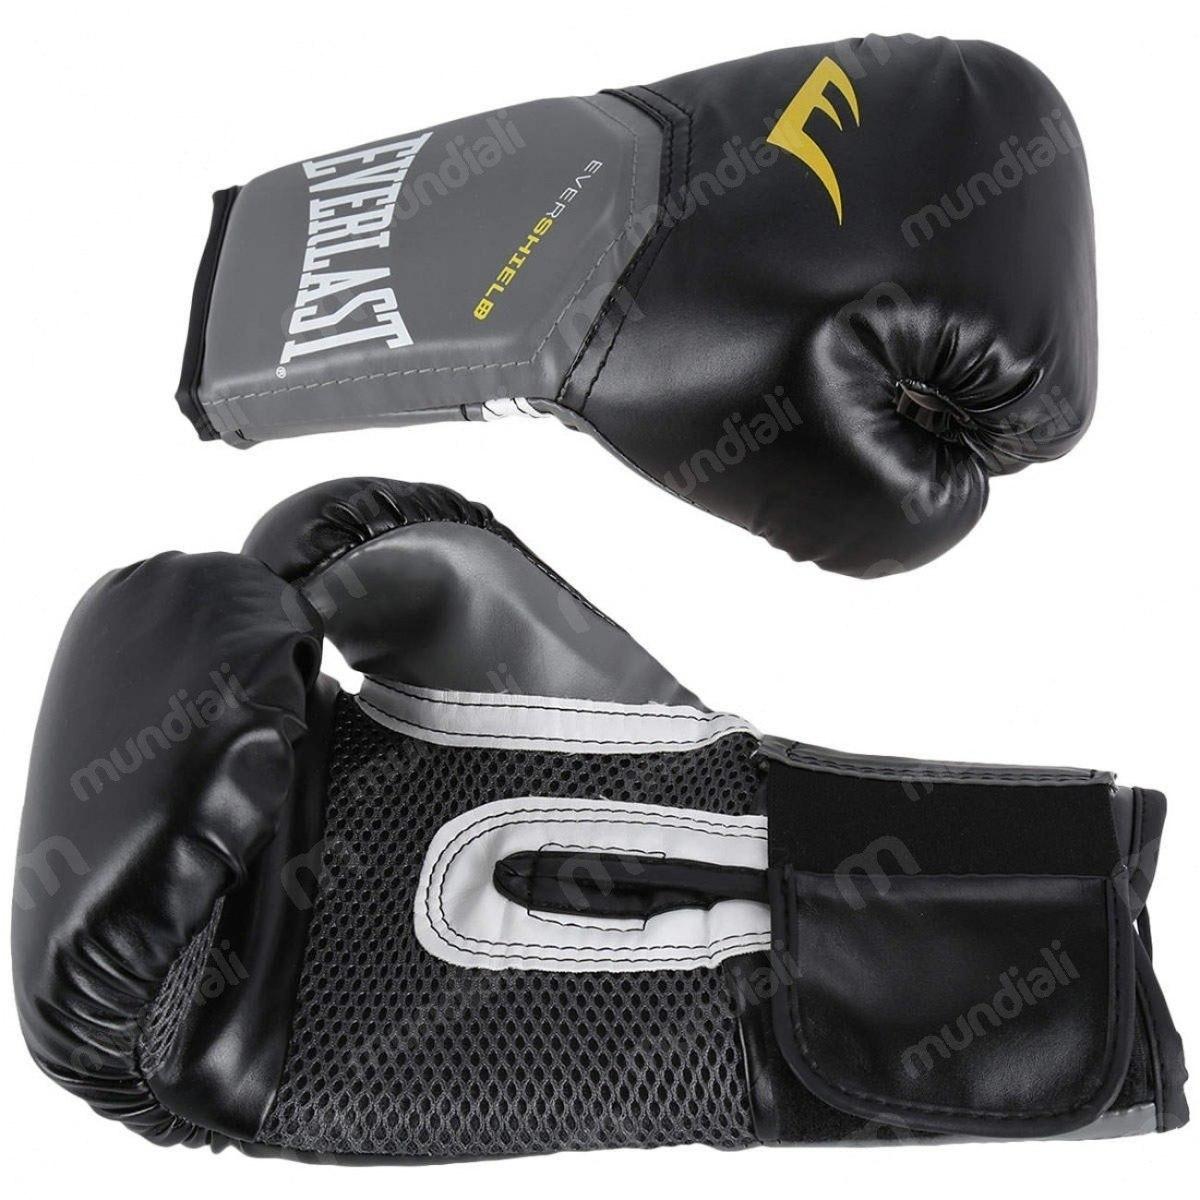 luva boxe everlast pro style elite training 12 oz preta. Carregando zoom. 71a03ba7900b6